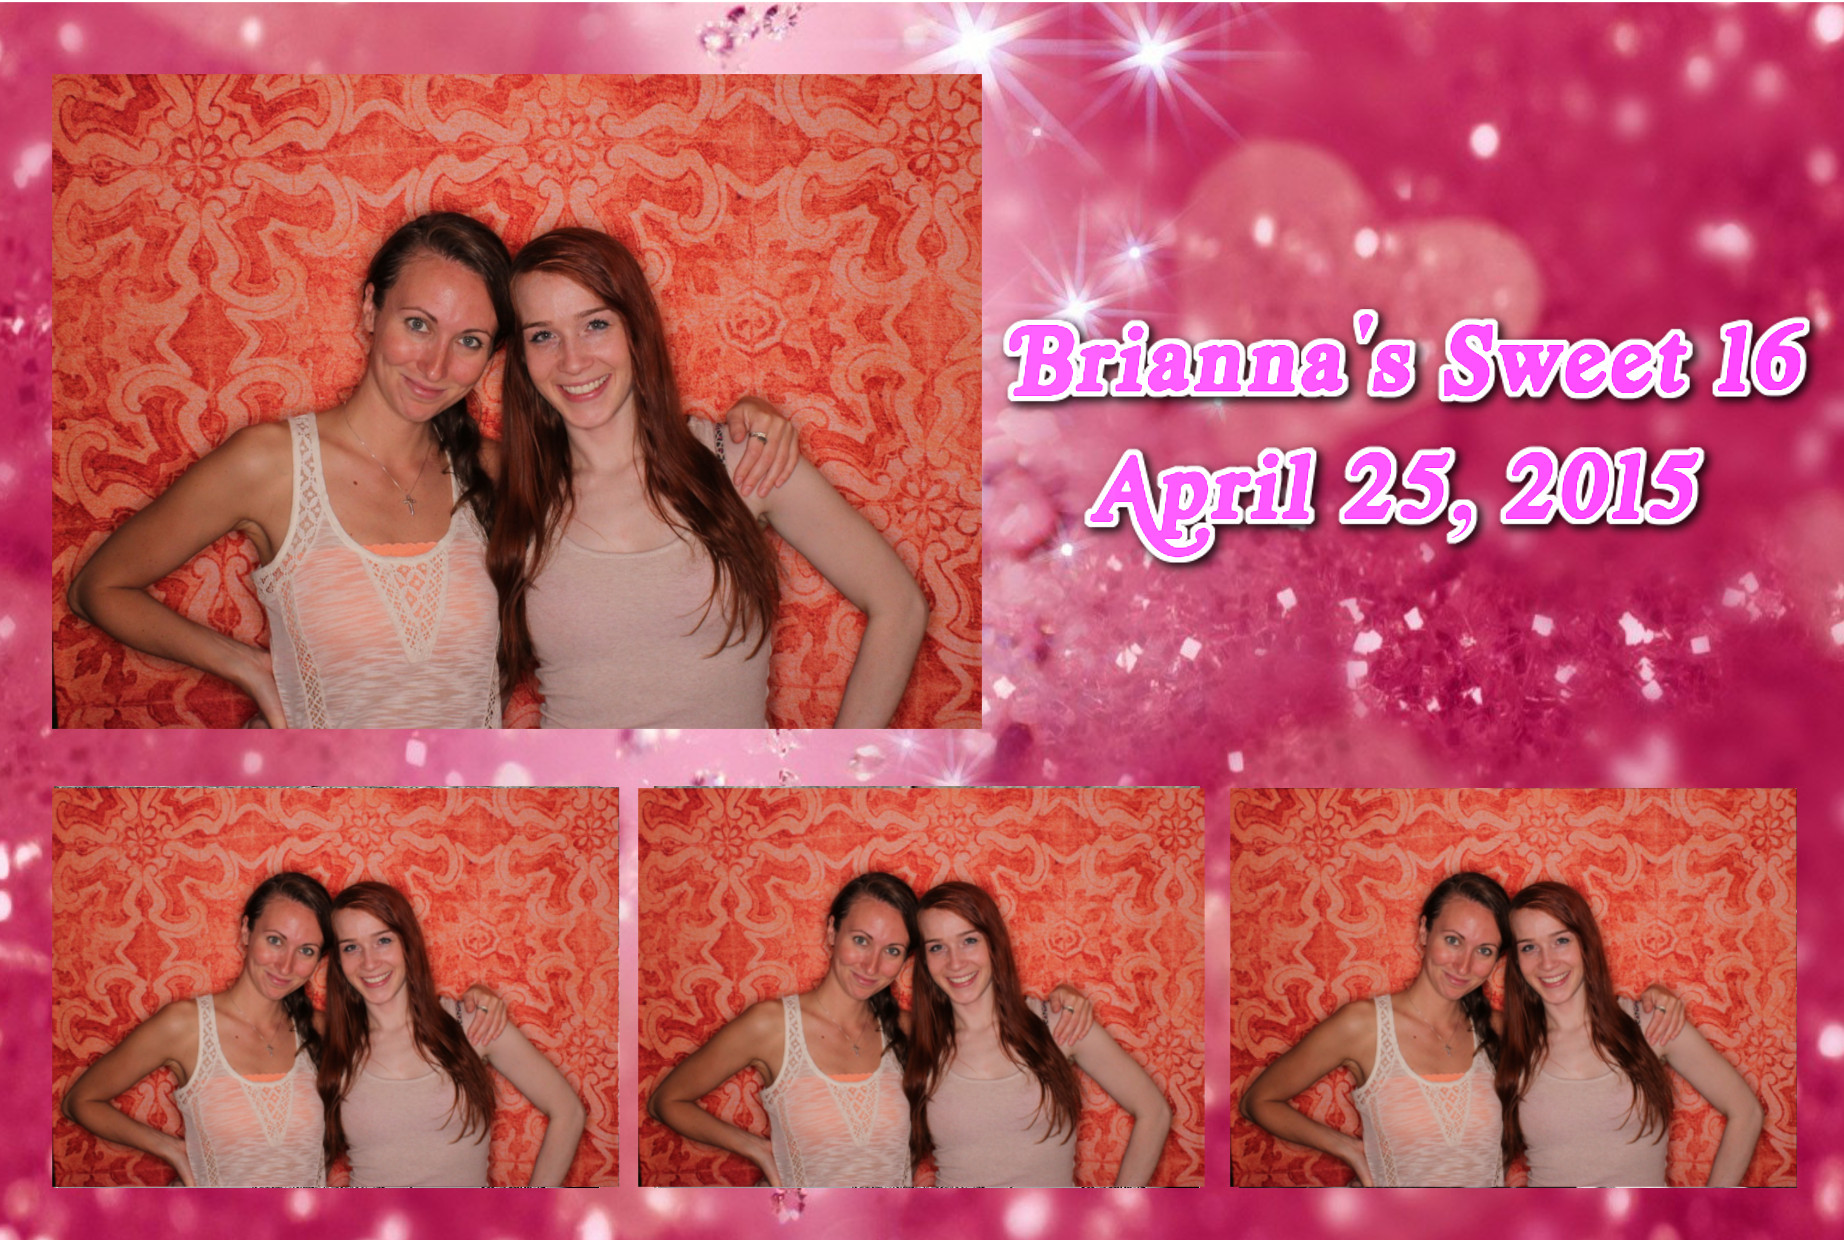 pinkglitterheartsample.jpg